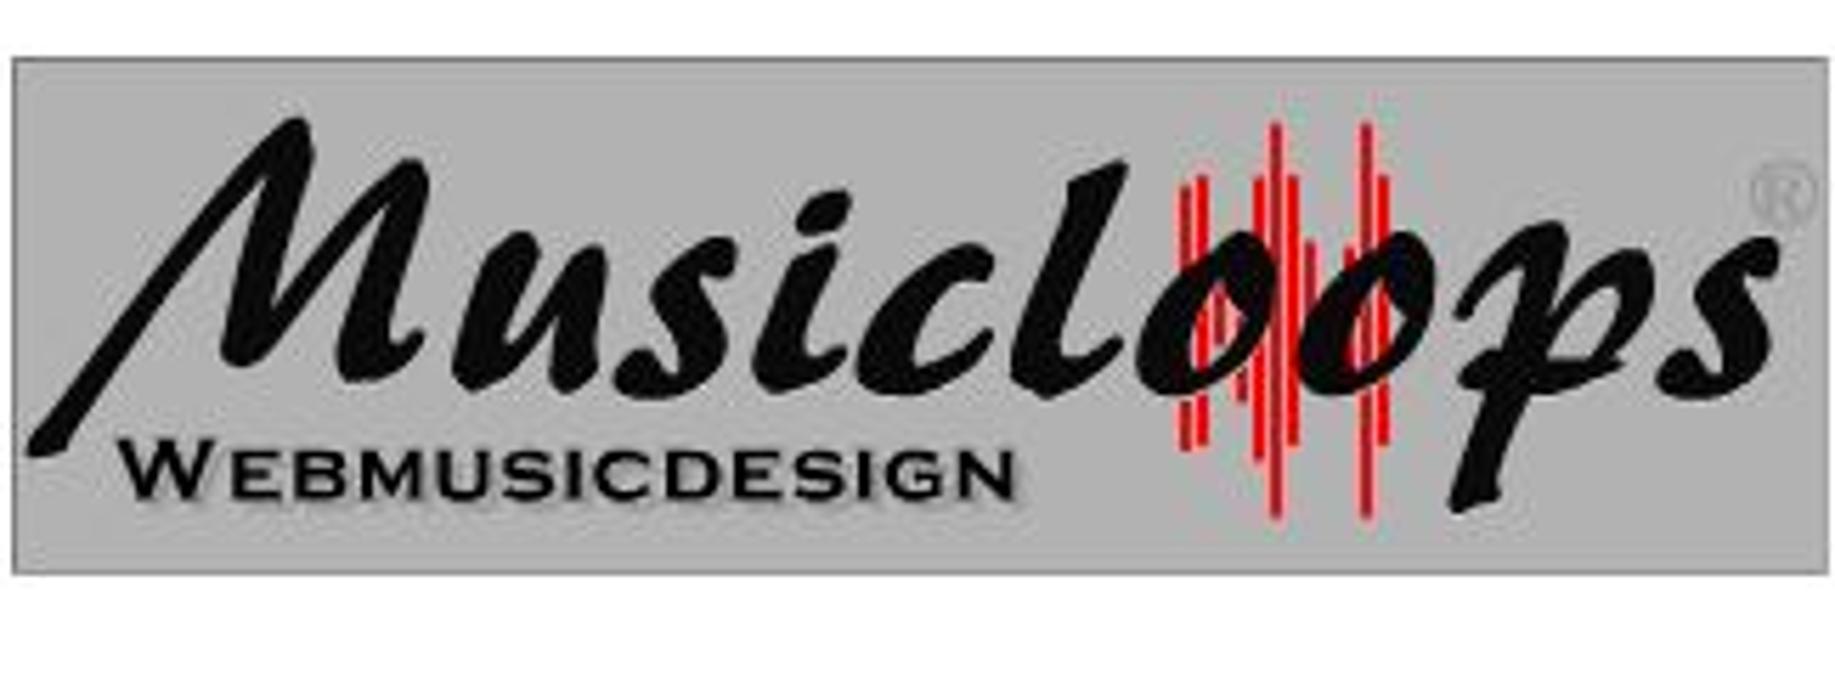 Musicloops Webmusicdesign